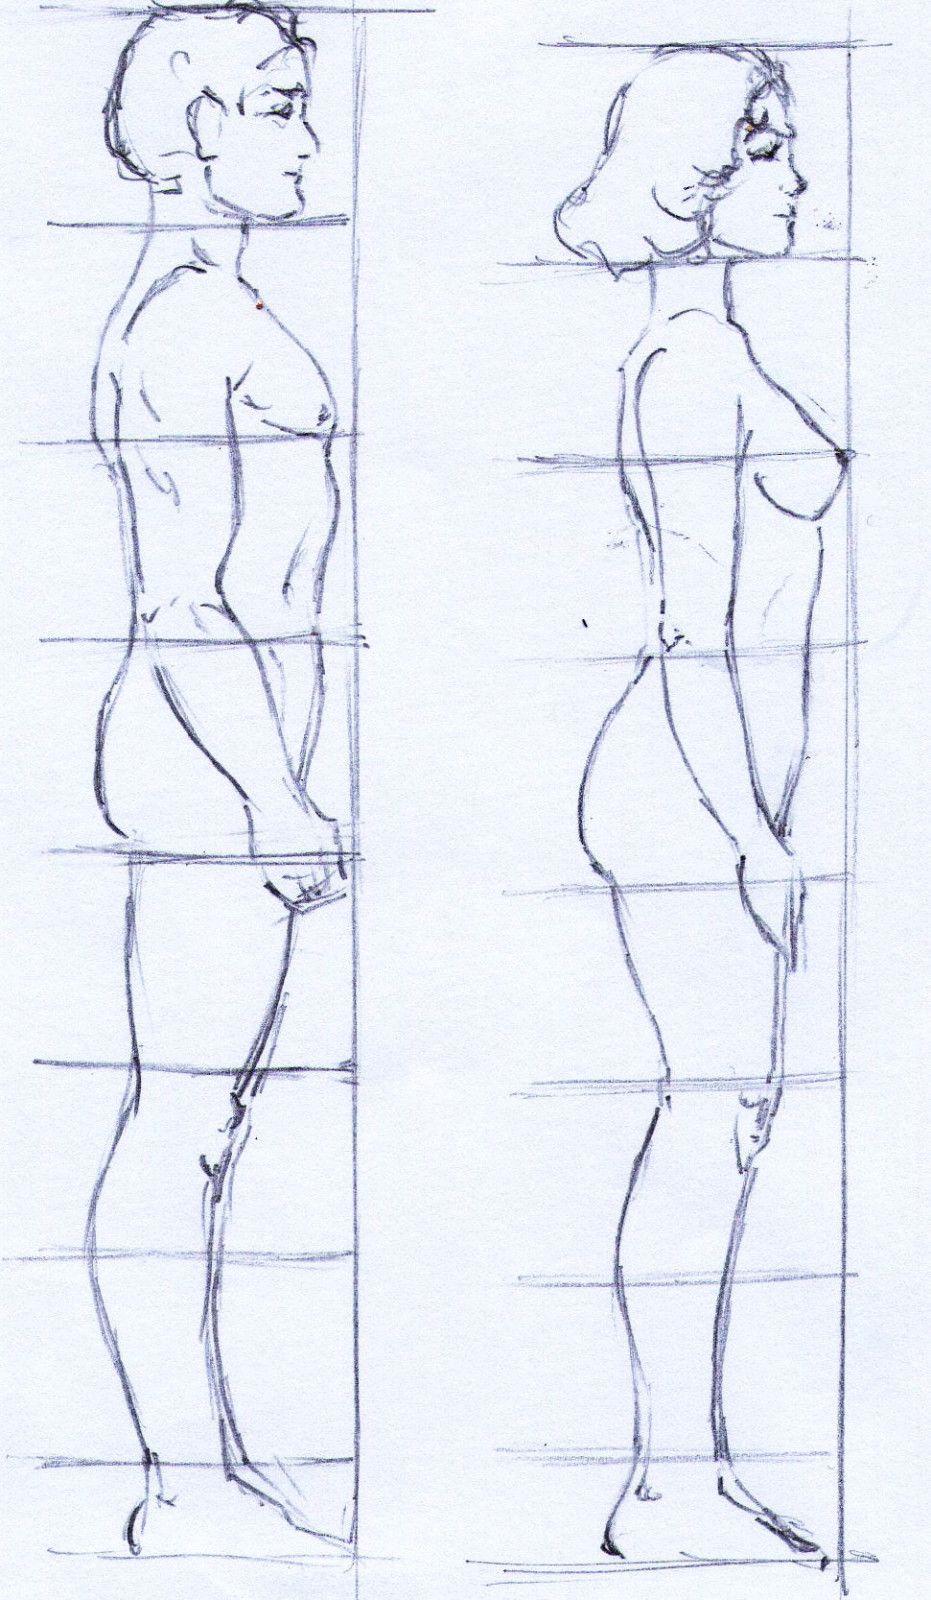 Pin de bill deanna en drawings pinterest - Dessin profil ...